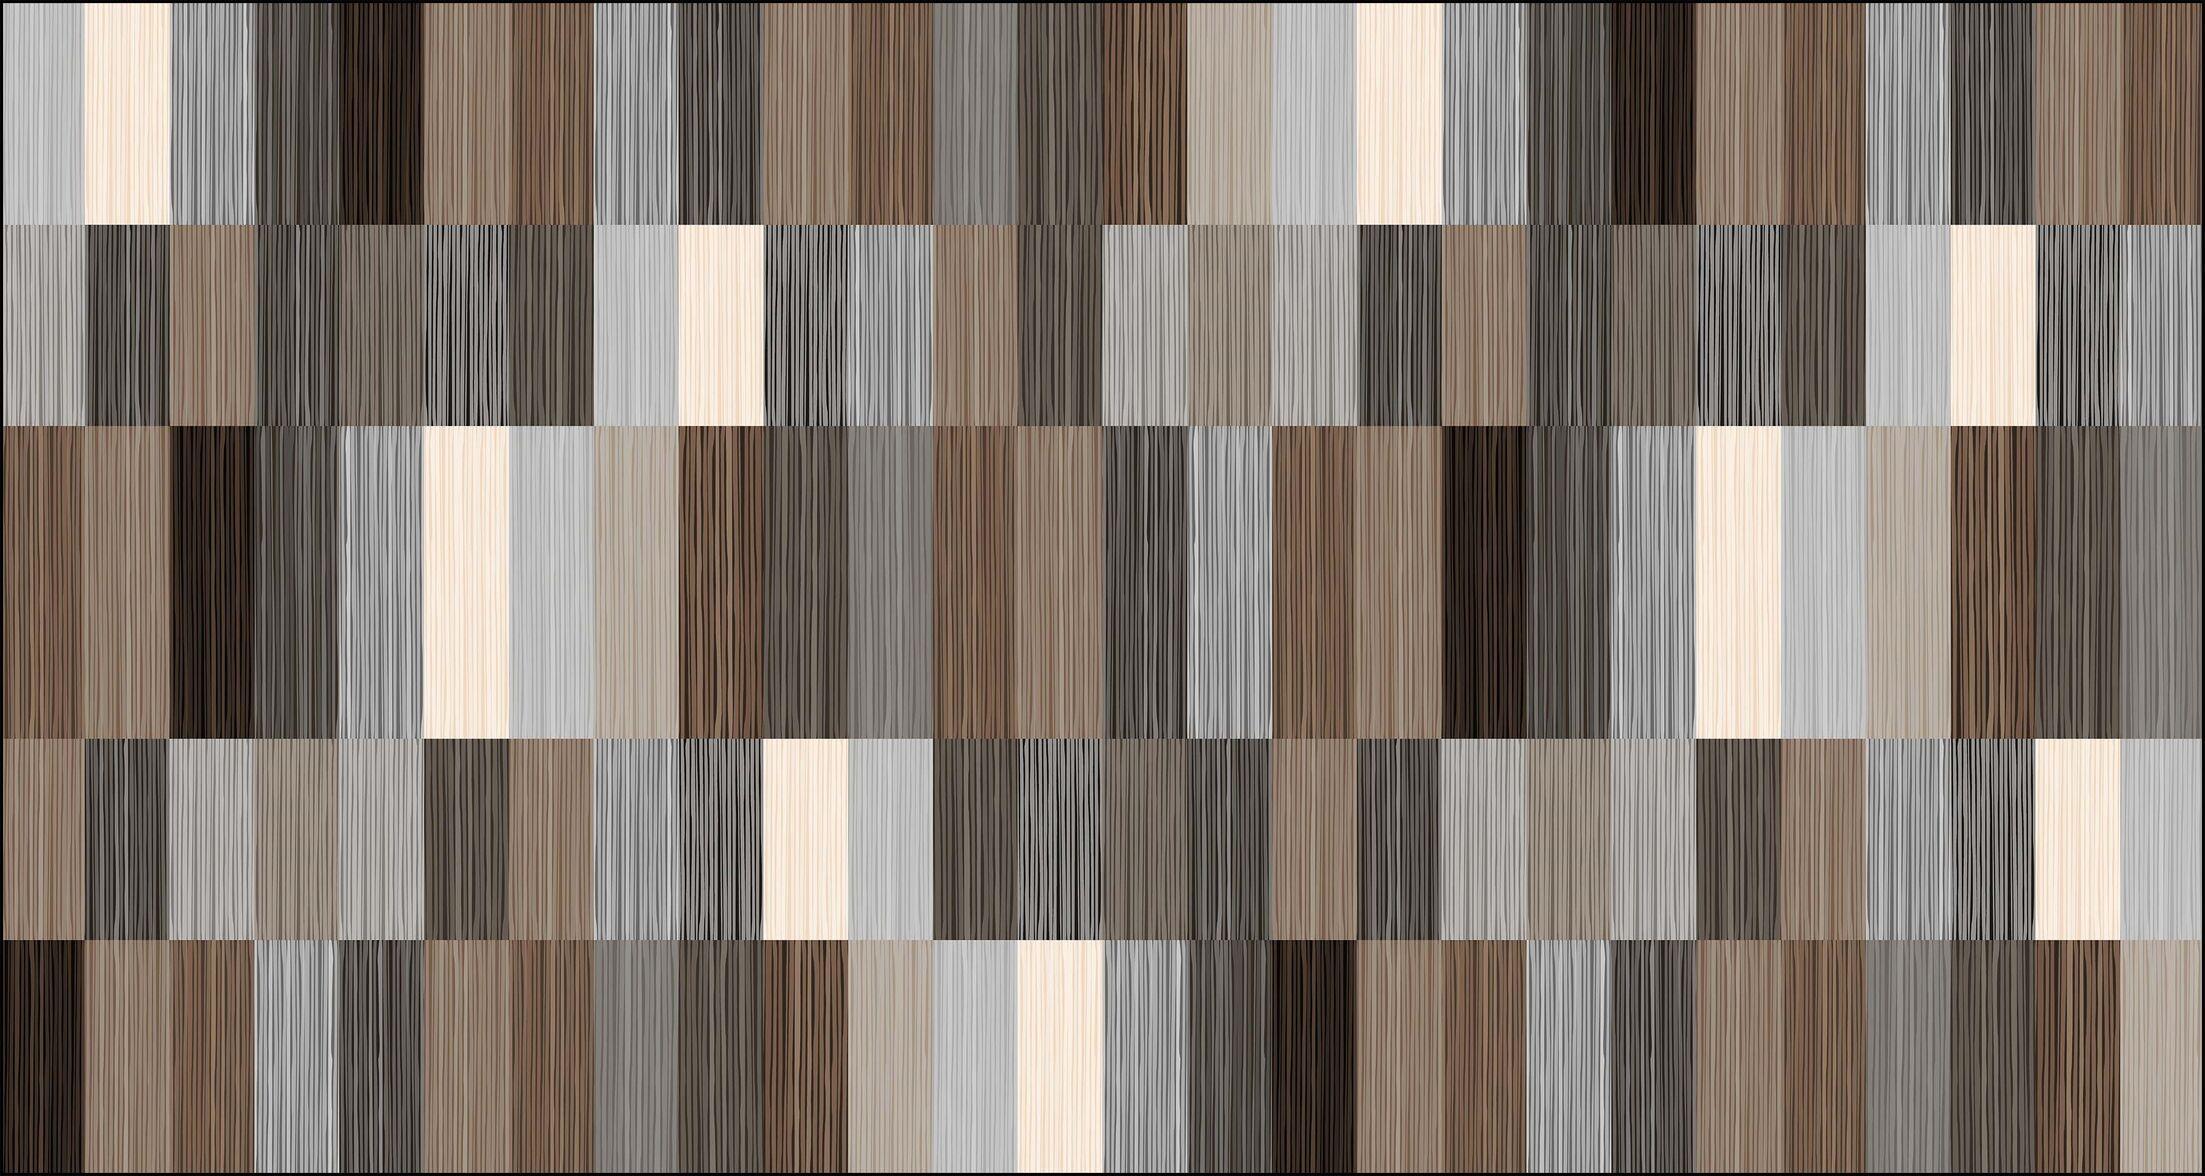 Forestville Brown/Gray Indoor/Outdoor Area Rug Size: Rectangle 5'3